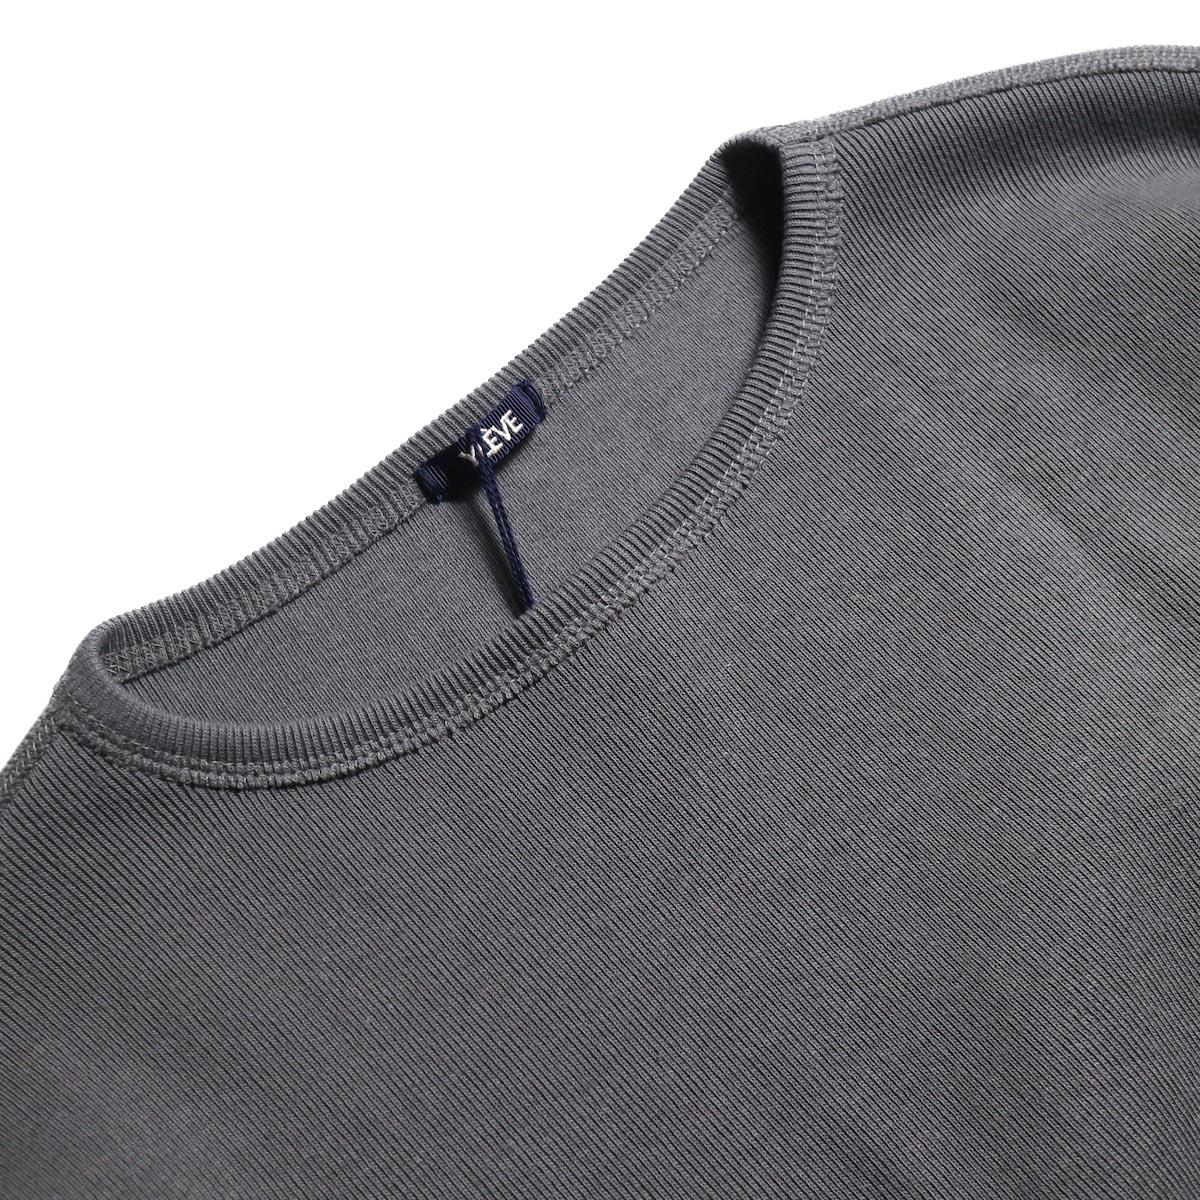 YLEVE / Cotton Rib Pullover (Slate Gray)襟